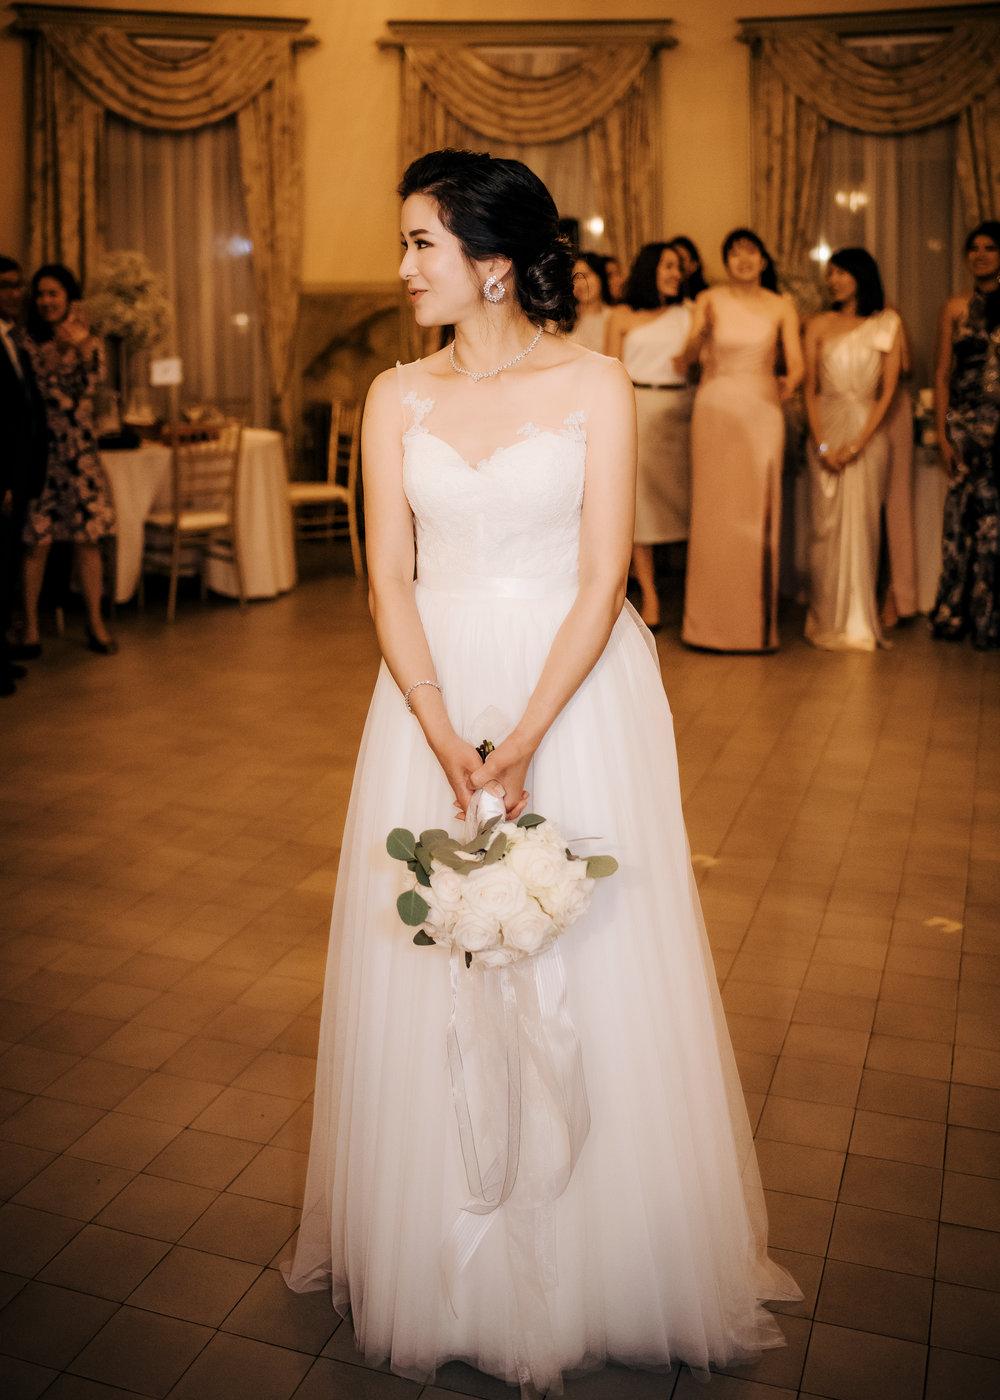 Turchin_20181014_Prim-Jacky-Wedding_542.jpg